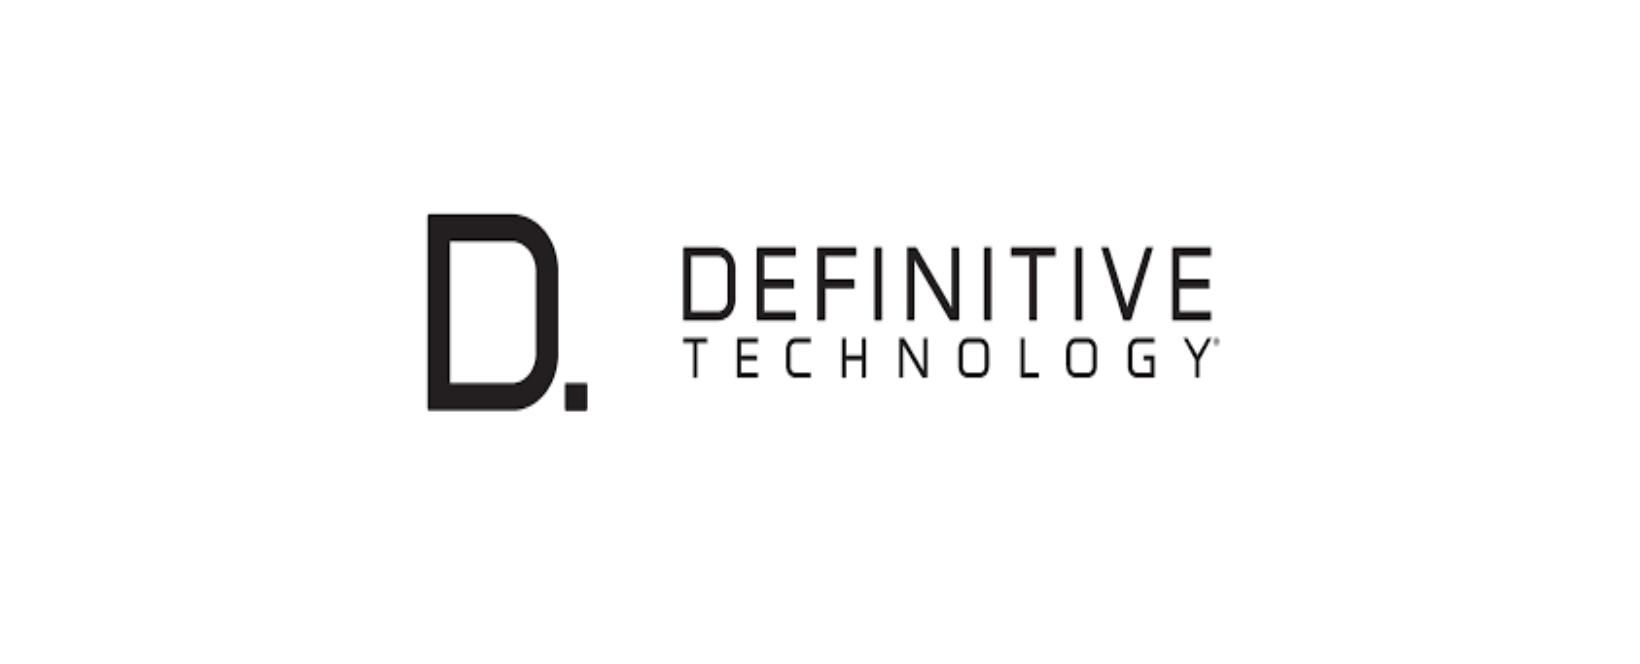 Definitive Technology Discount Code 2021